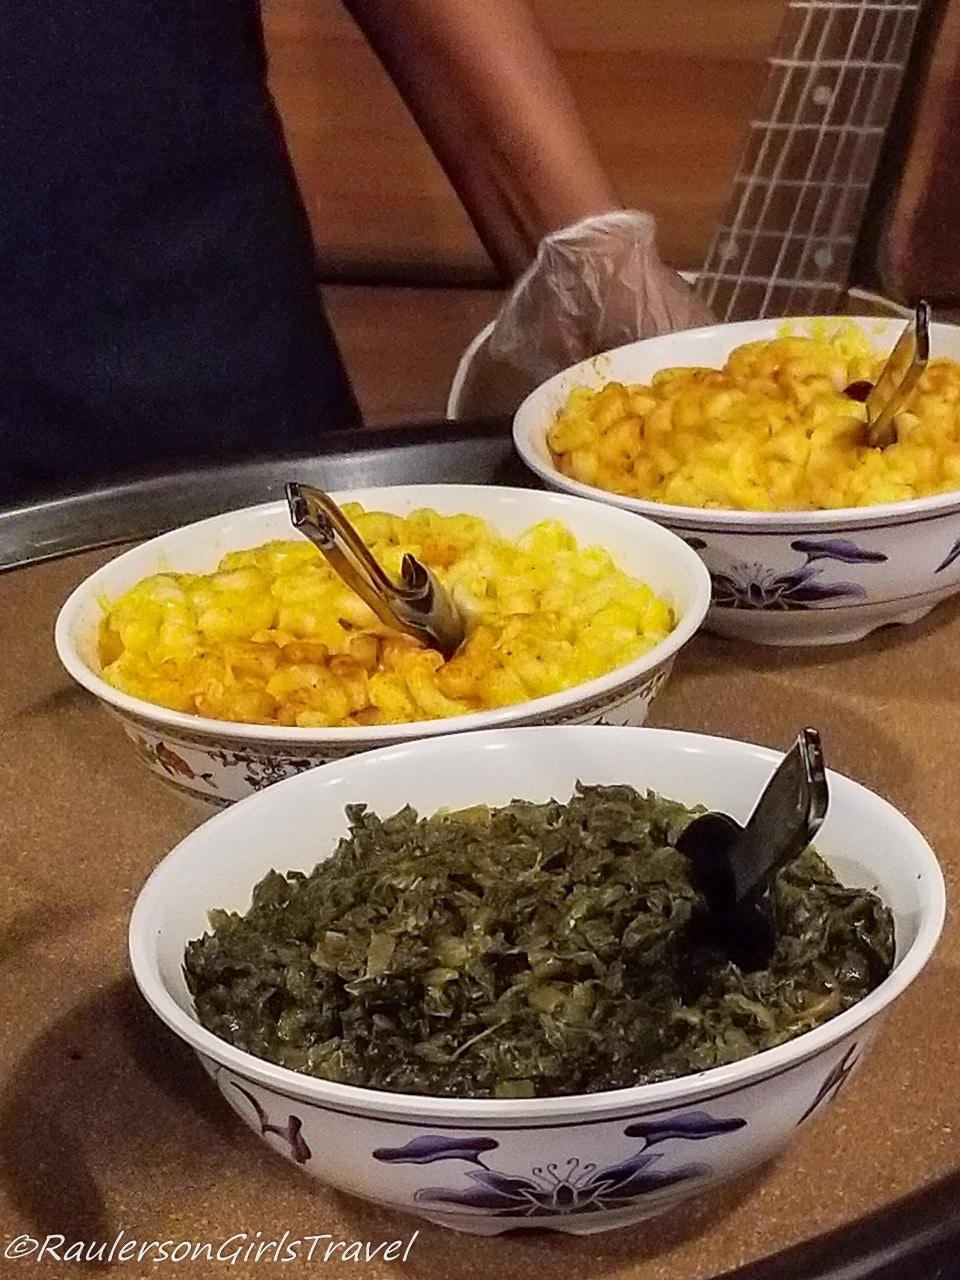 Mac and Cheese and Collard Greens at Central BBQ